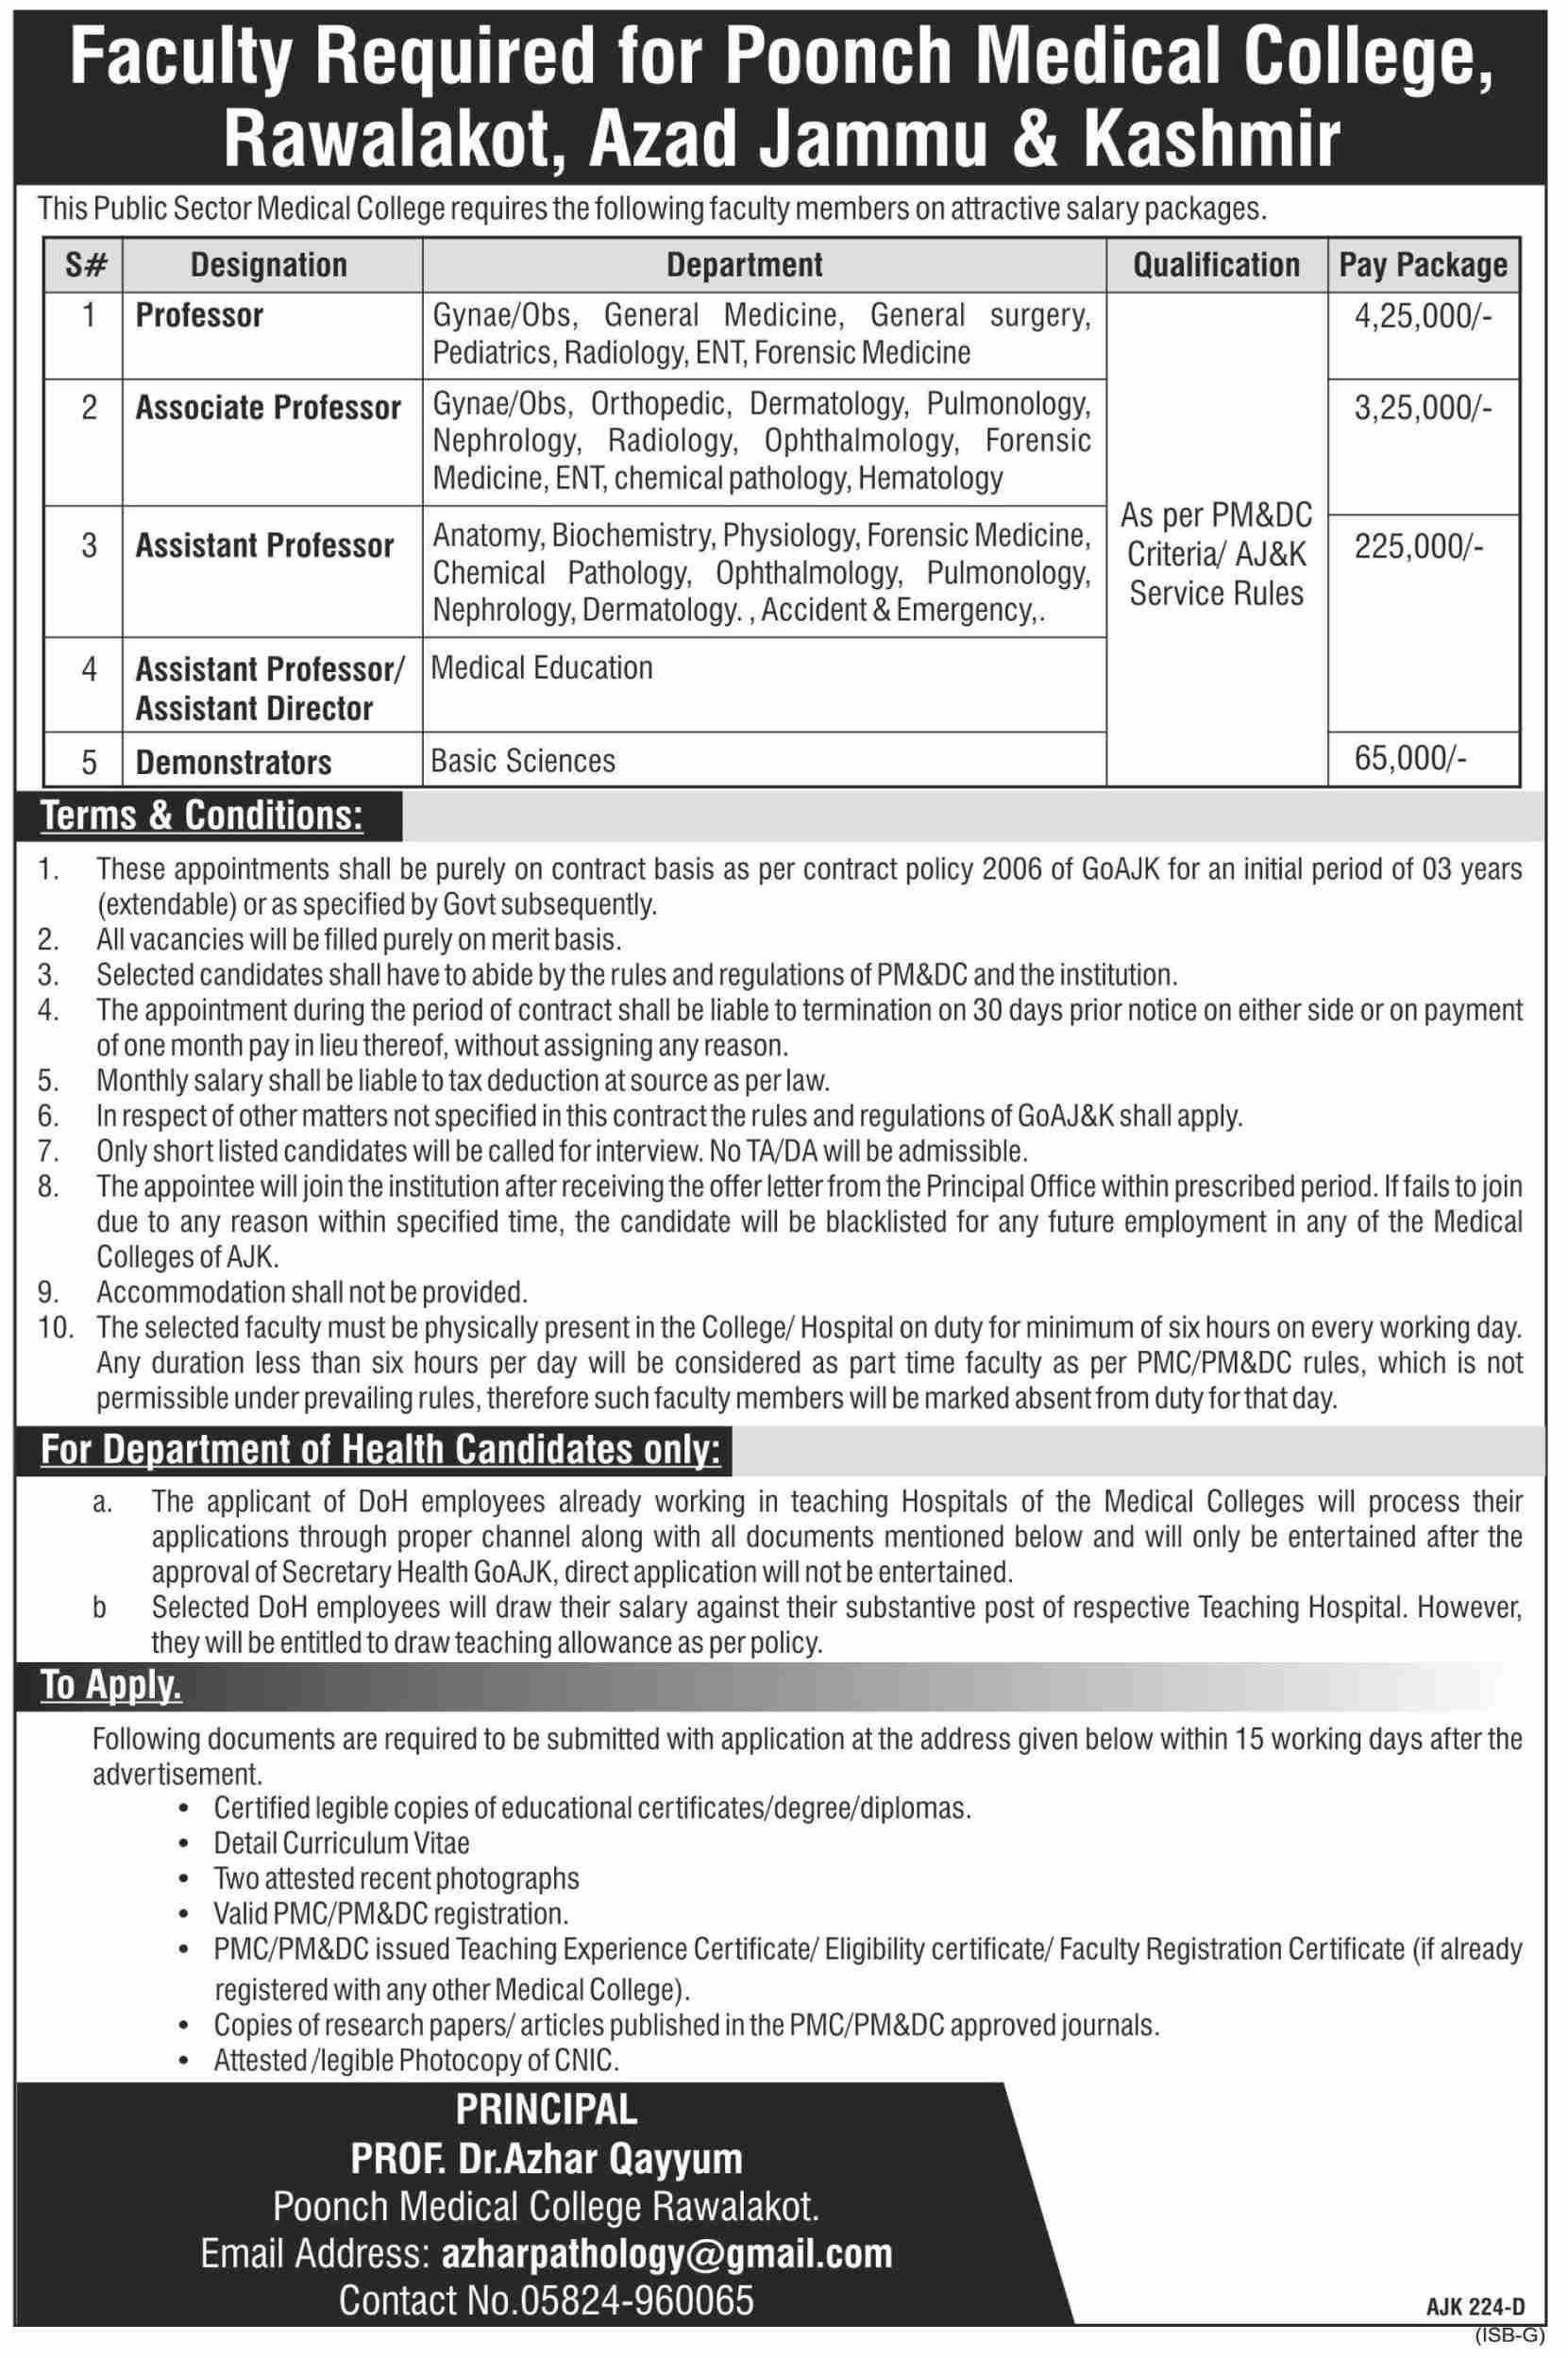 Jobs In Poonch Medical College Rawalakot AJ&K 04 January 2020